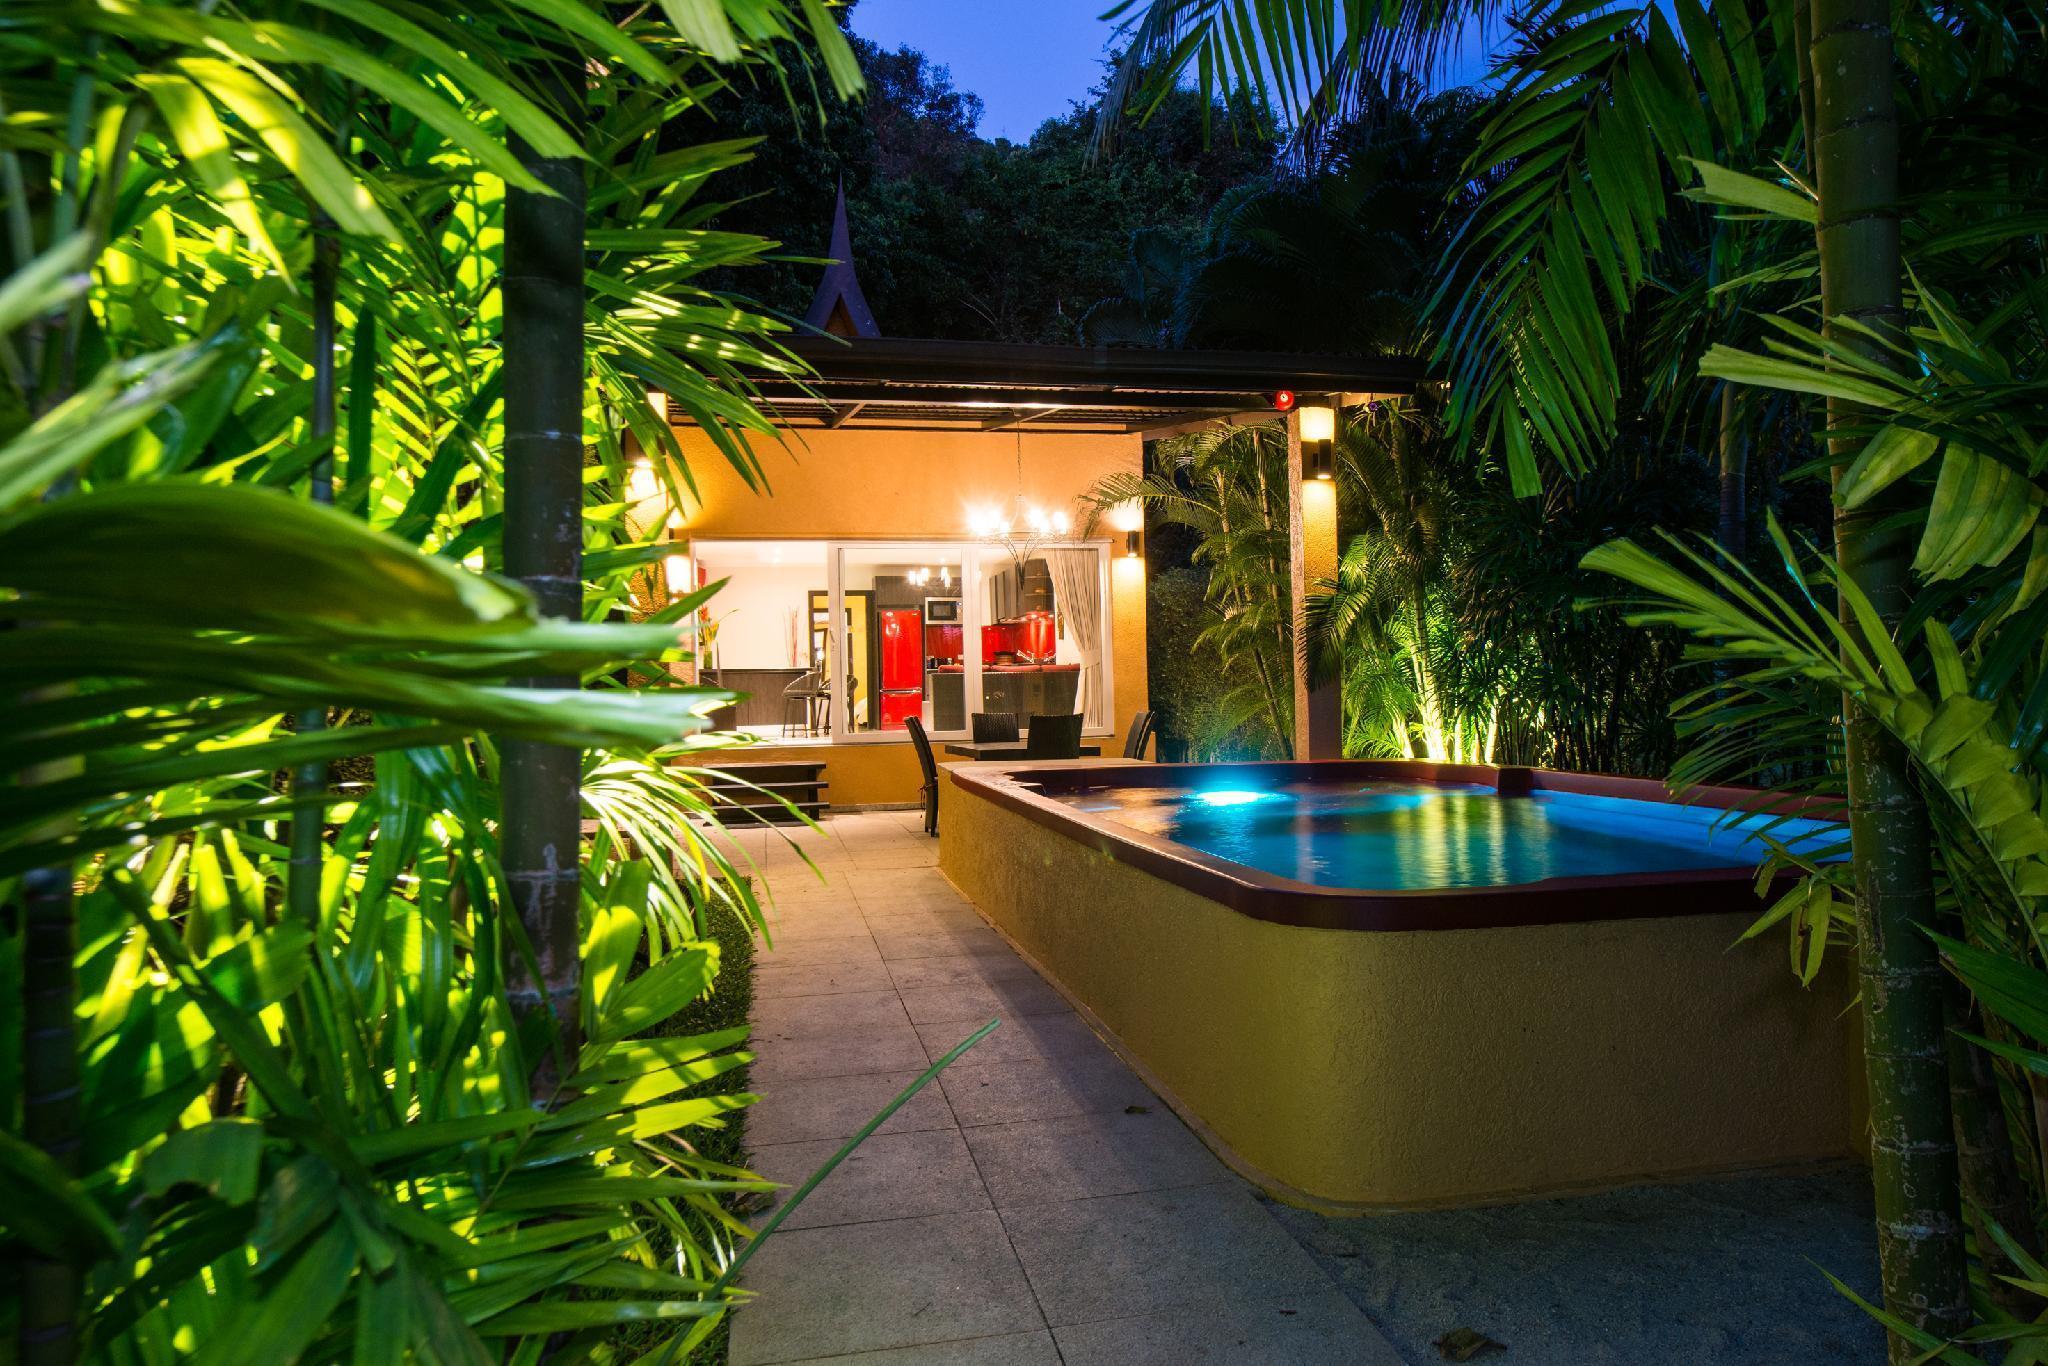 Red Sunset Villa  Private Pool  Hotel Managed วิลลา 3 ห้องนอน 3 ห้องน้ำส่วนตัว ขนาด 120 ตร.ม. – คลองสน